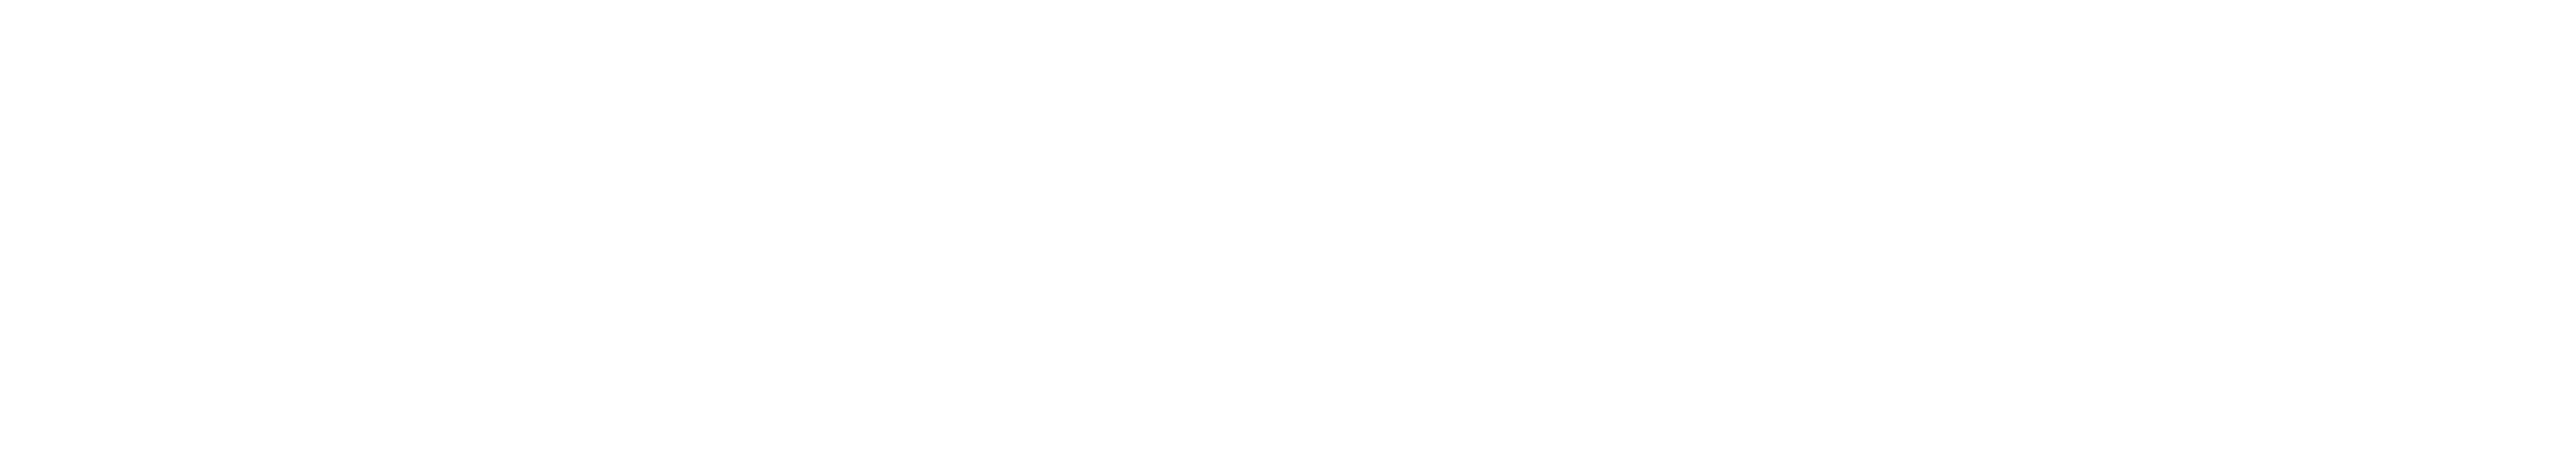 ViewSource Technology & Digital Marketing Group